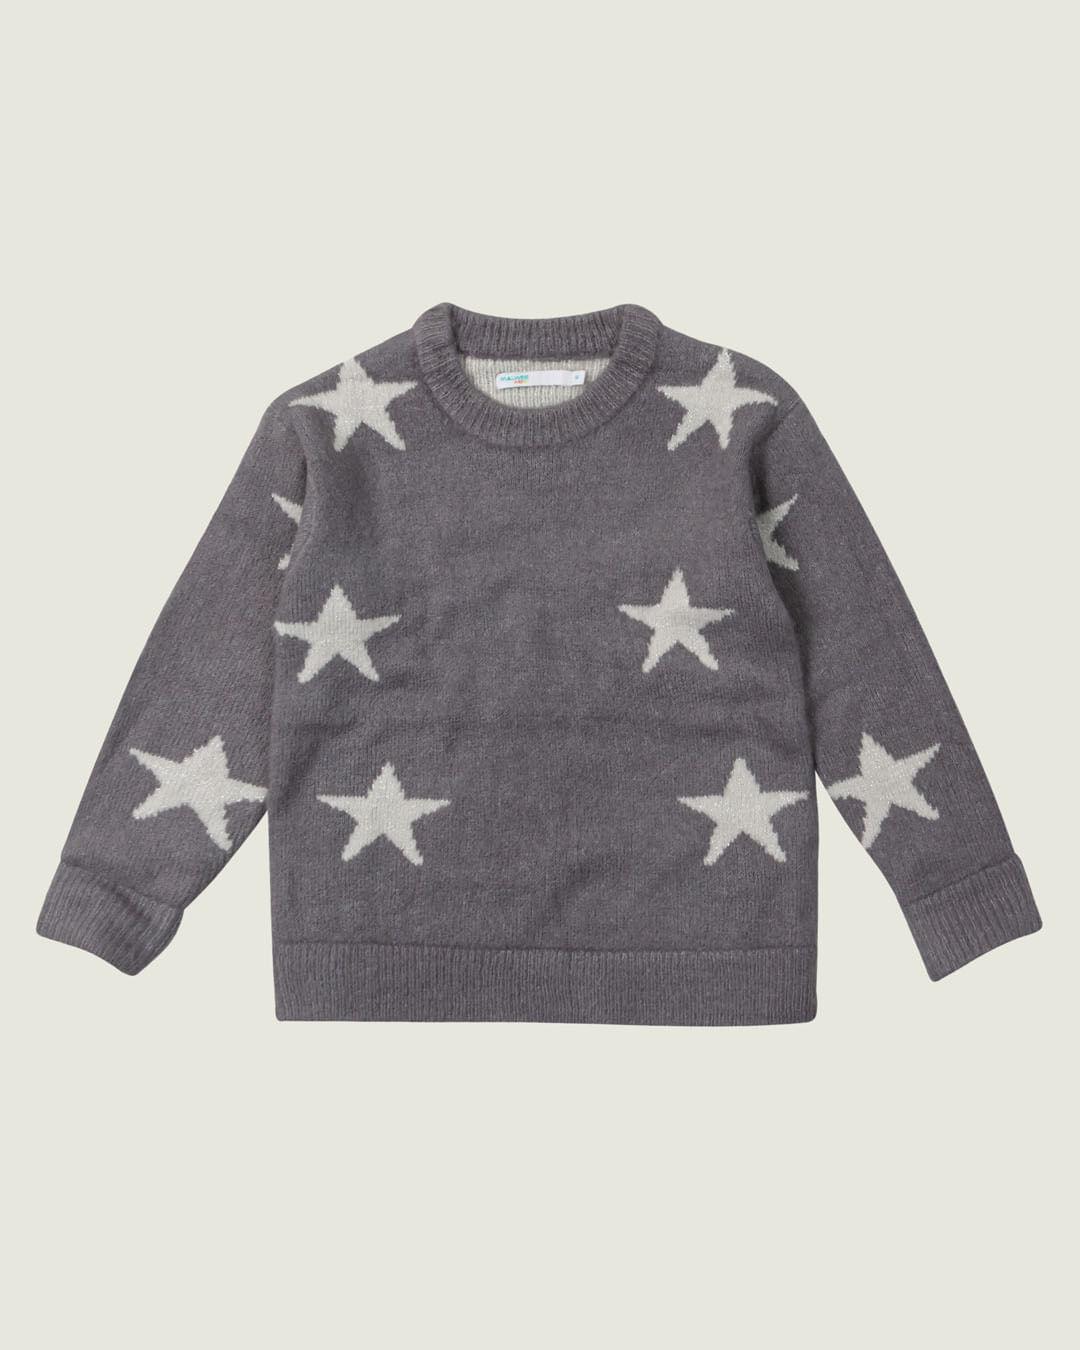 Blusão - Malwee Kids - Estrelas - Tricô - Cinza Escuro - Menina